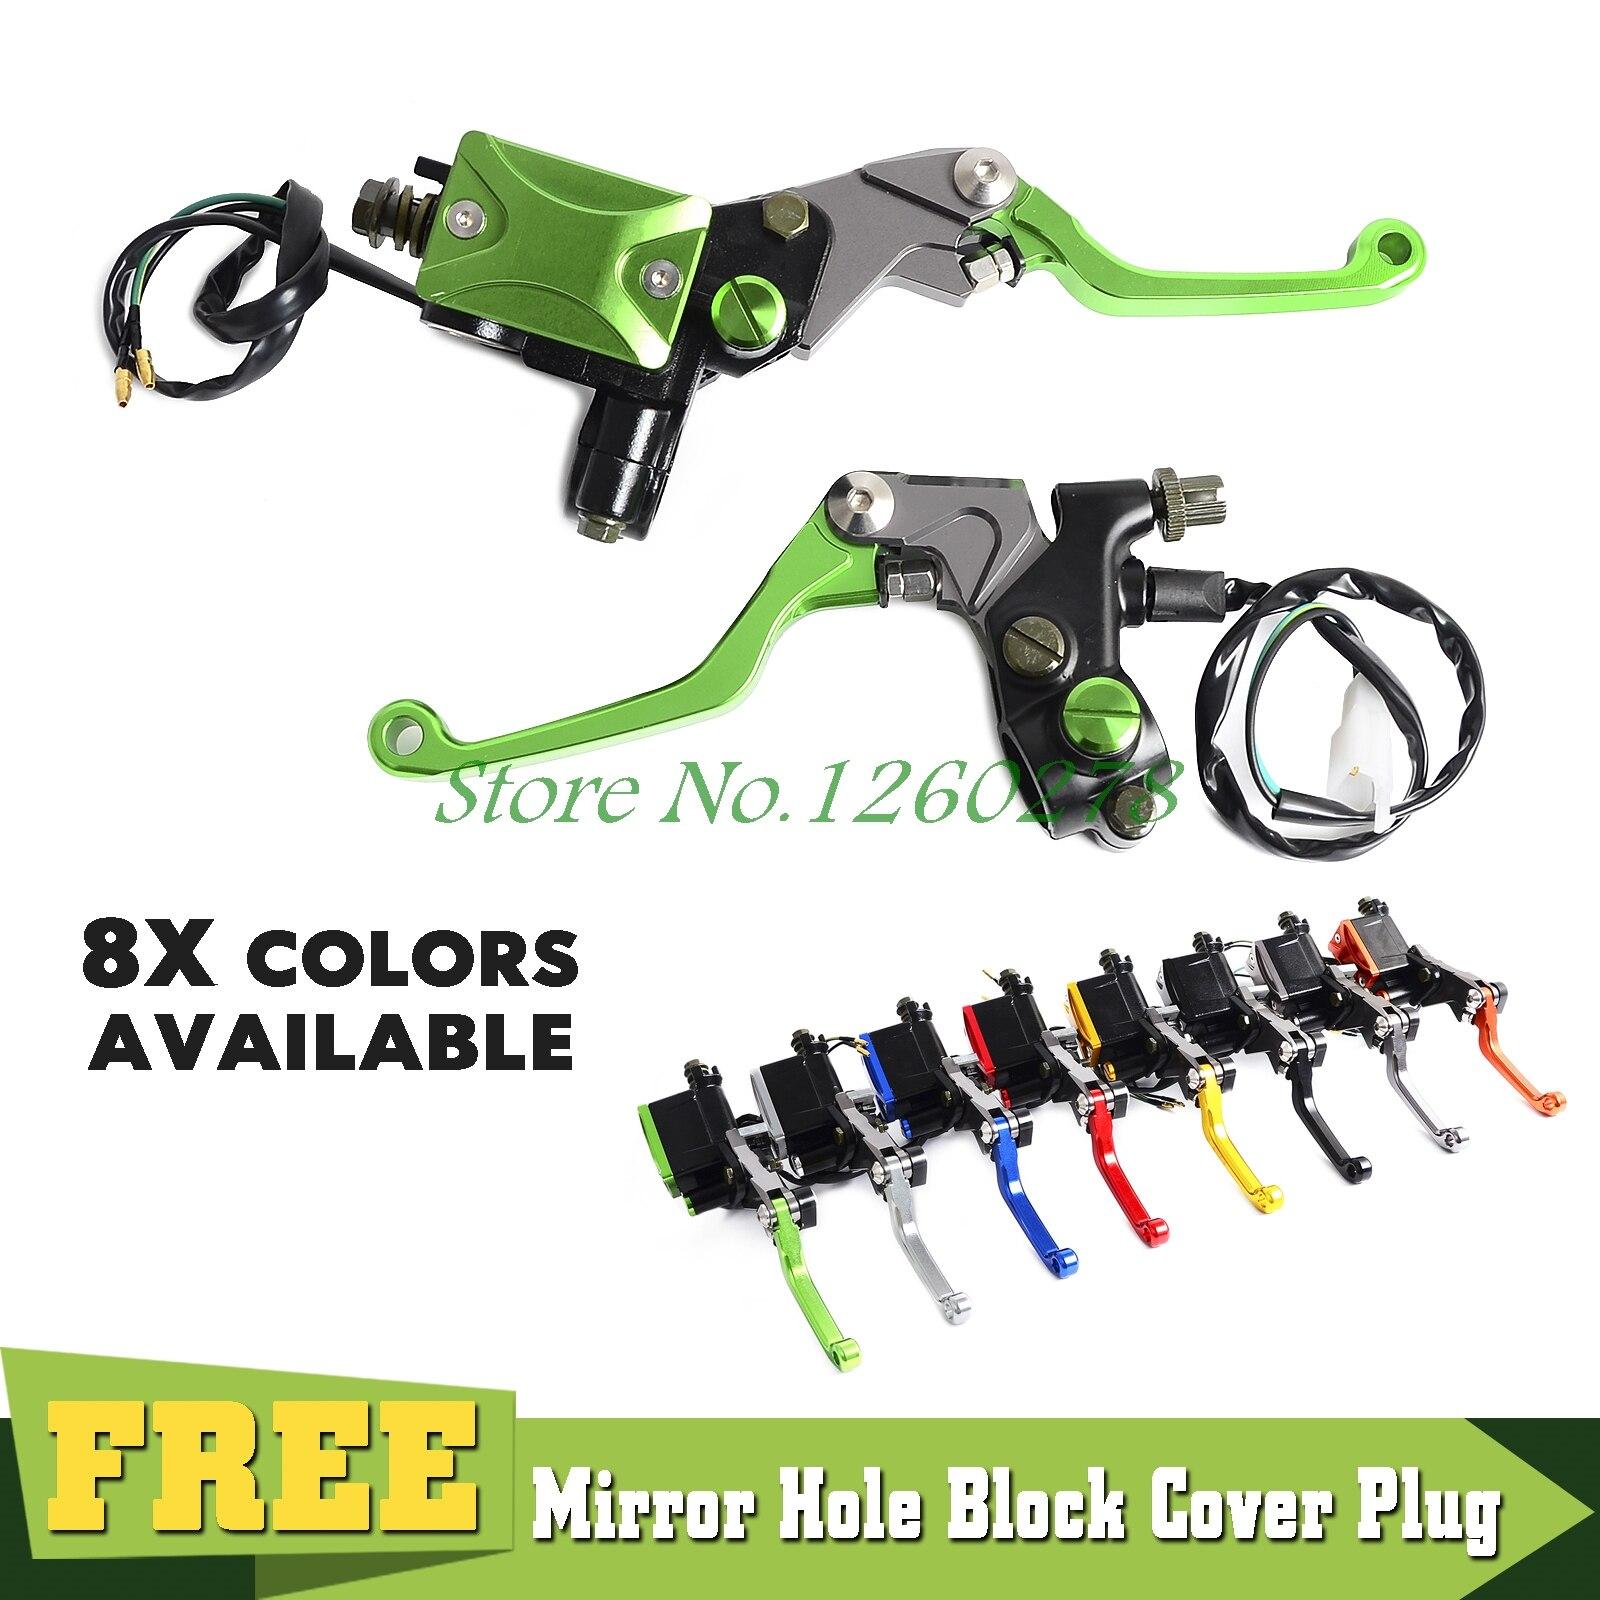 Universal Clutch Brake Master Cylinder Kit Reservoir Levers Set For Kawasaki KX65 KX85 KX125/250 KLX125 250 450 NINJA 250R 300R